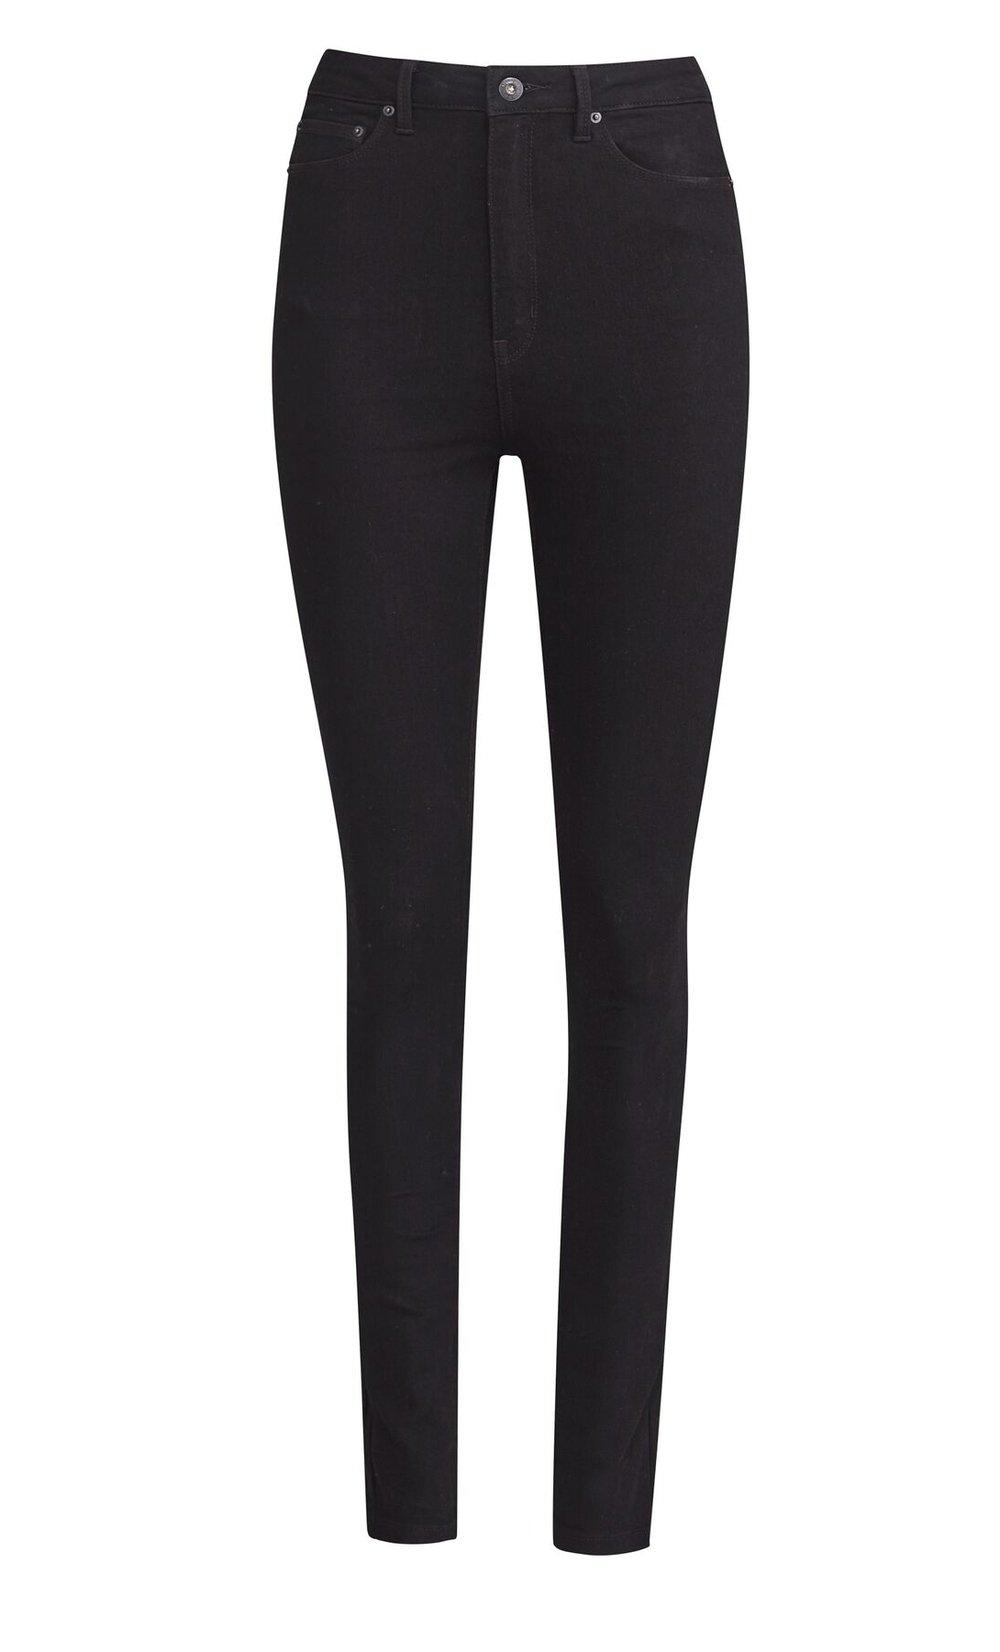 JH Denim  high waist skinny jean (denim) black rinse